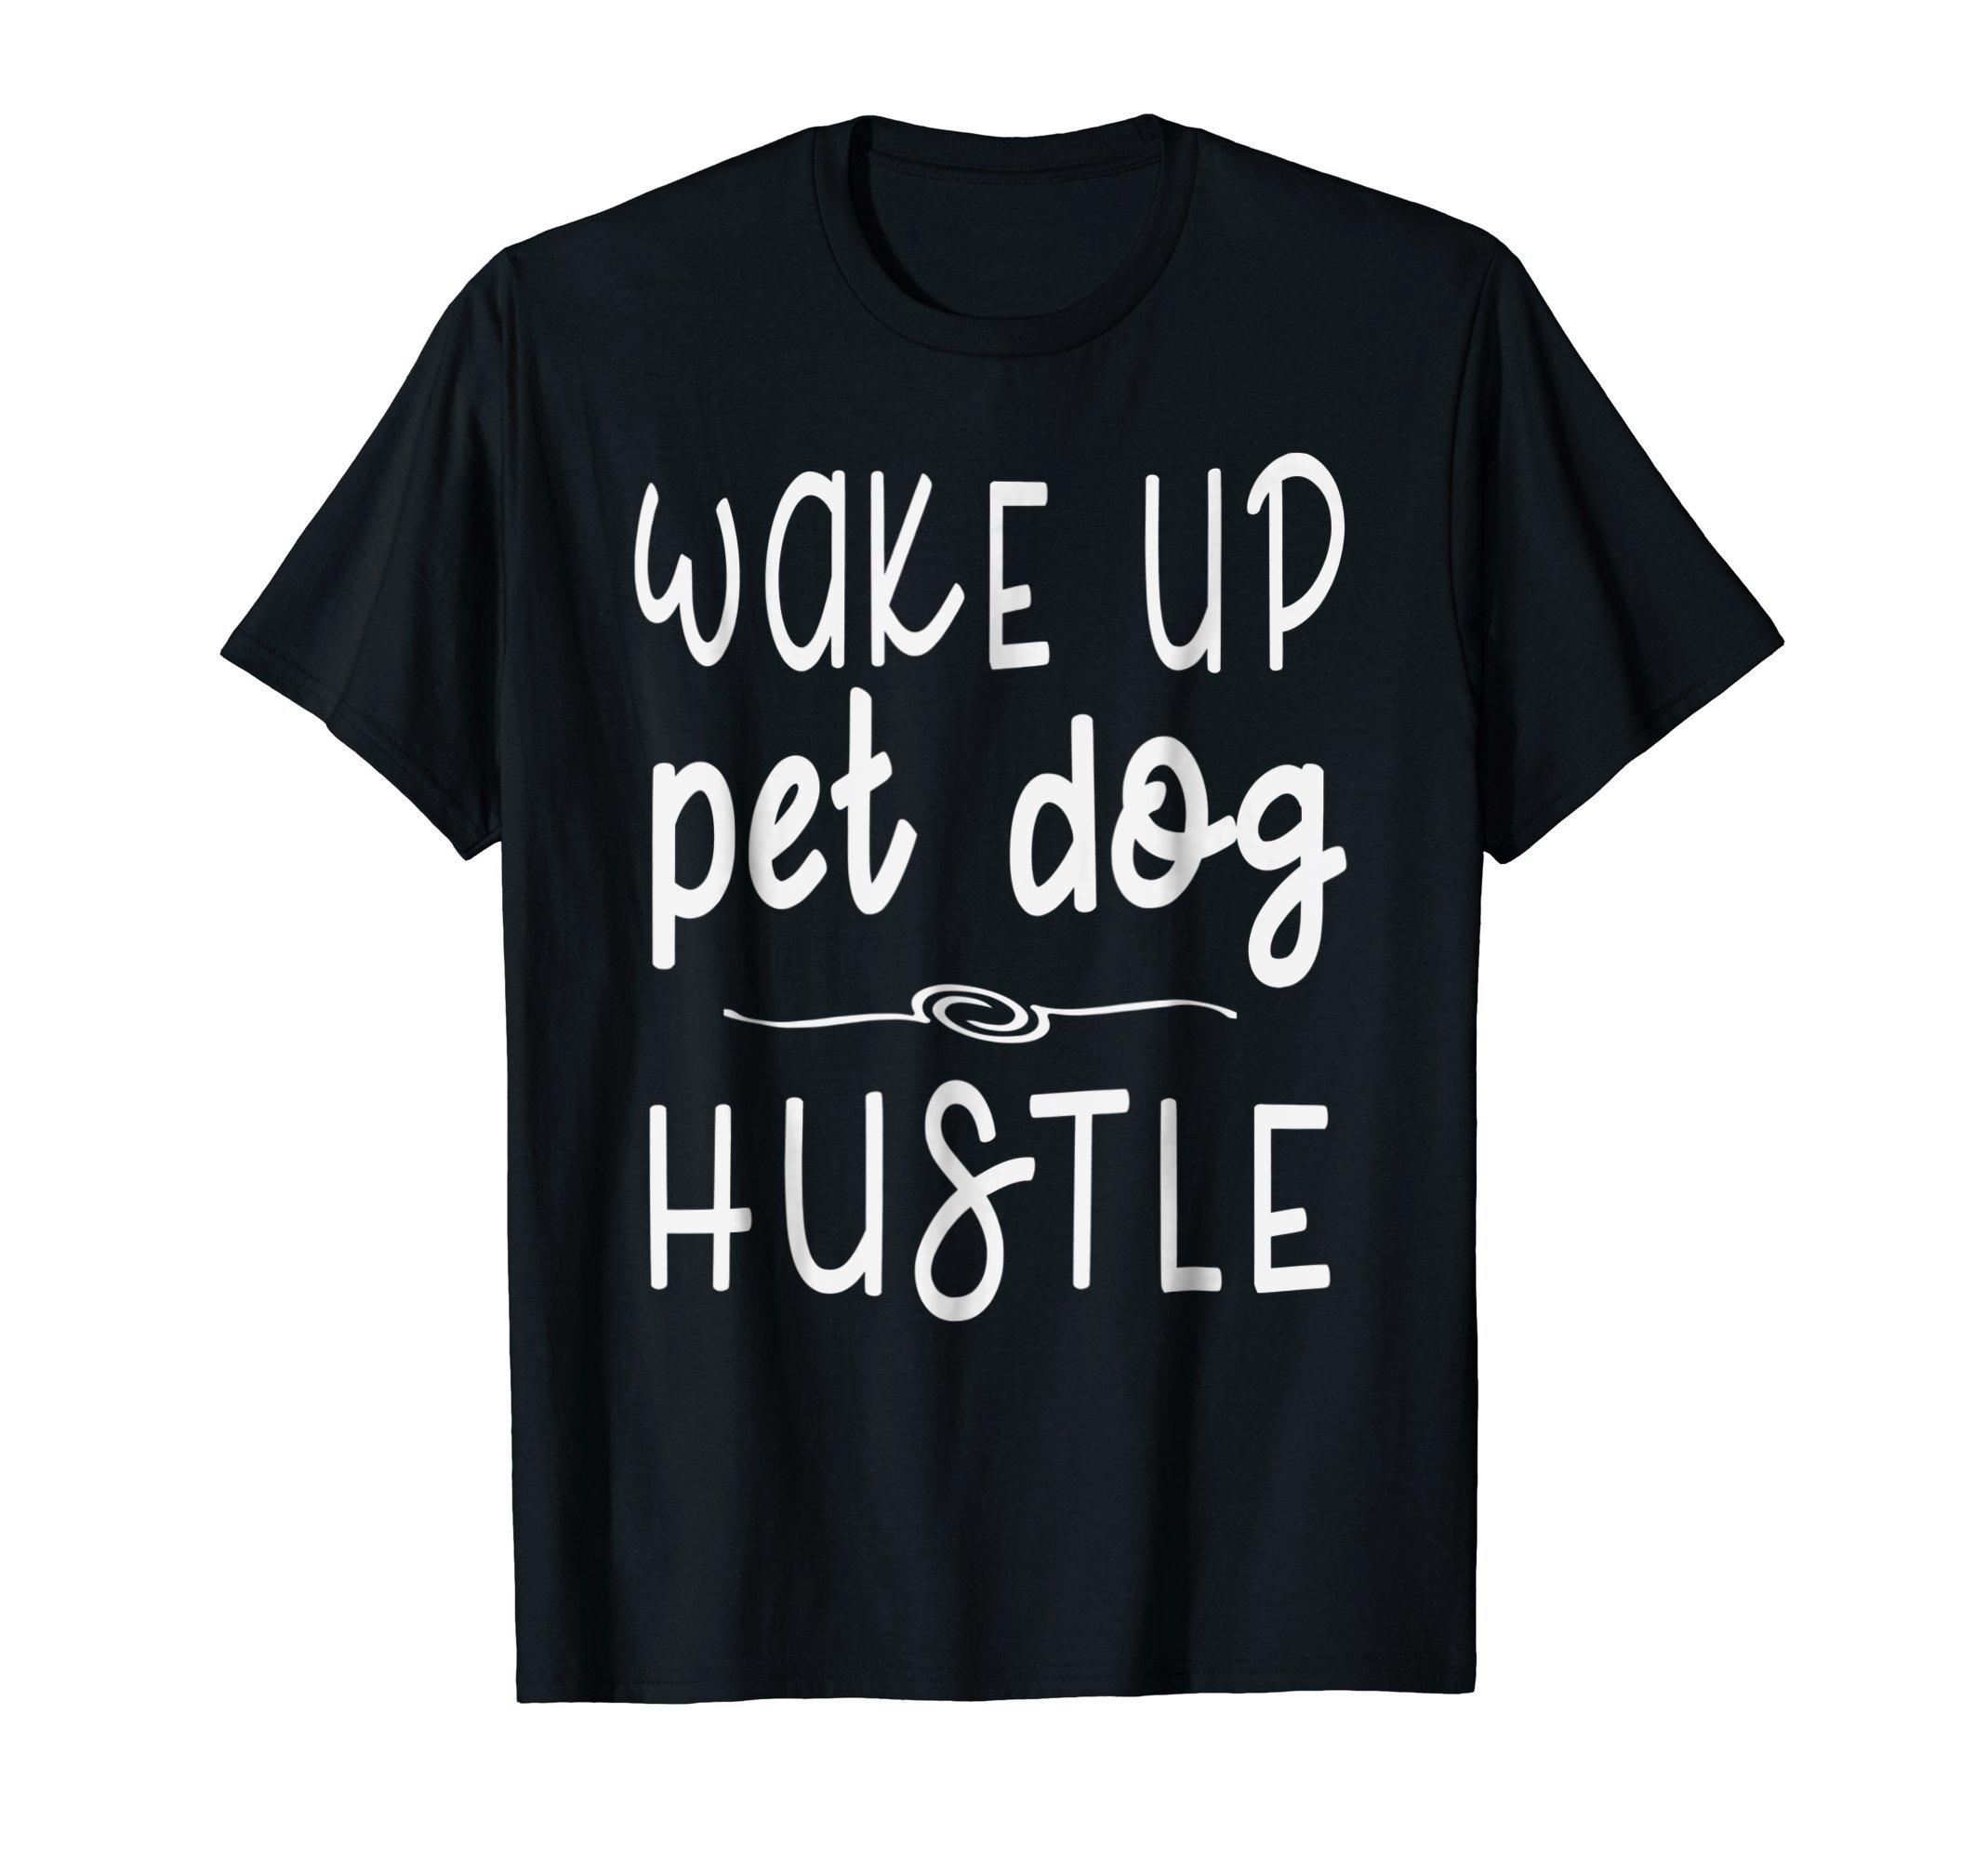 Wake Up Pet Dog Hustle T-Shirt